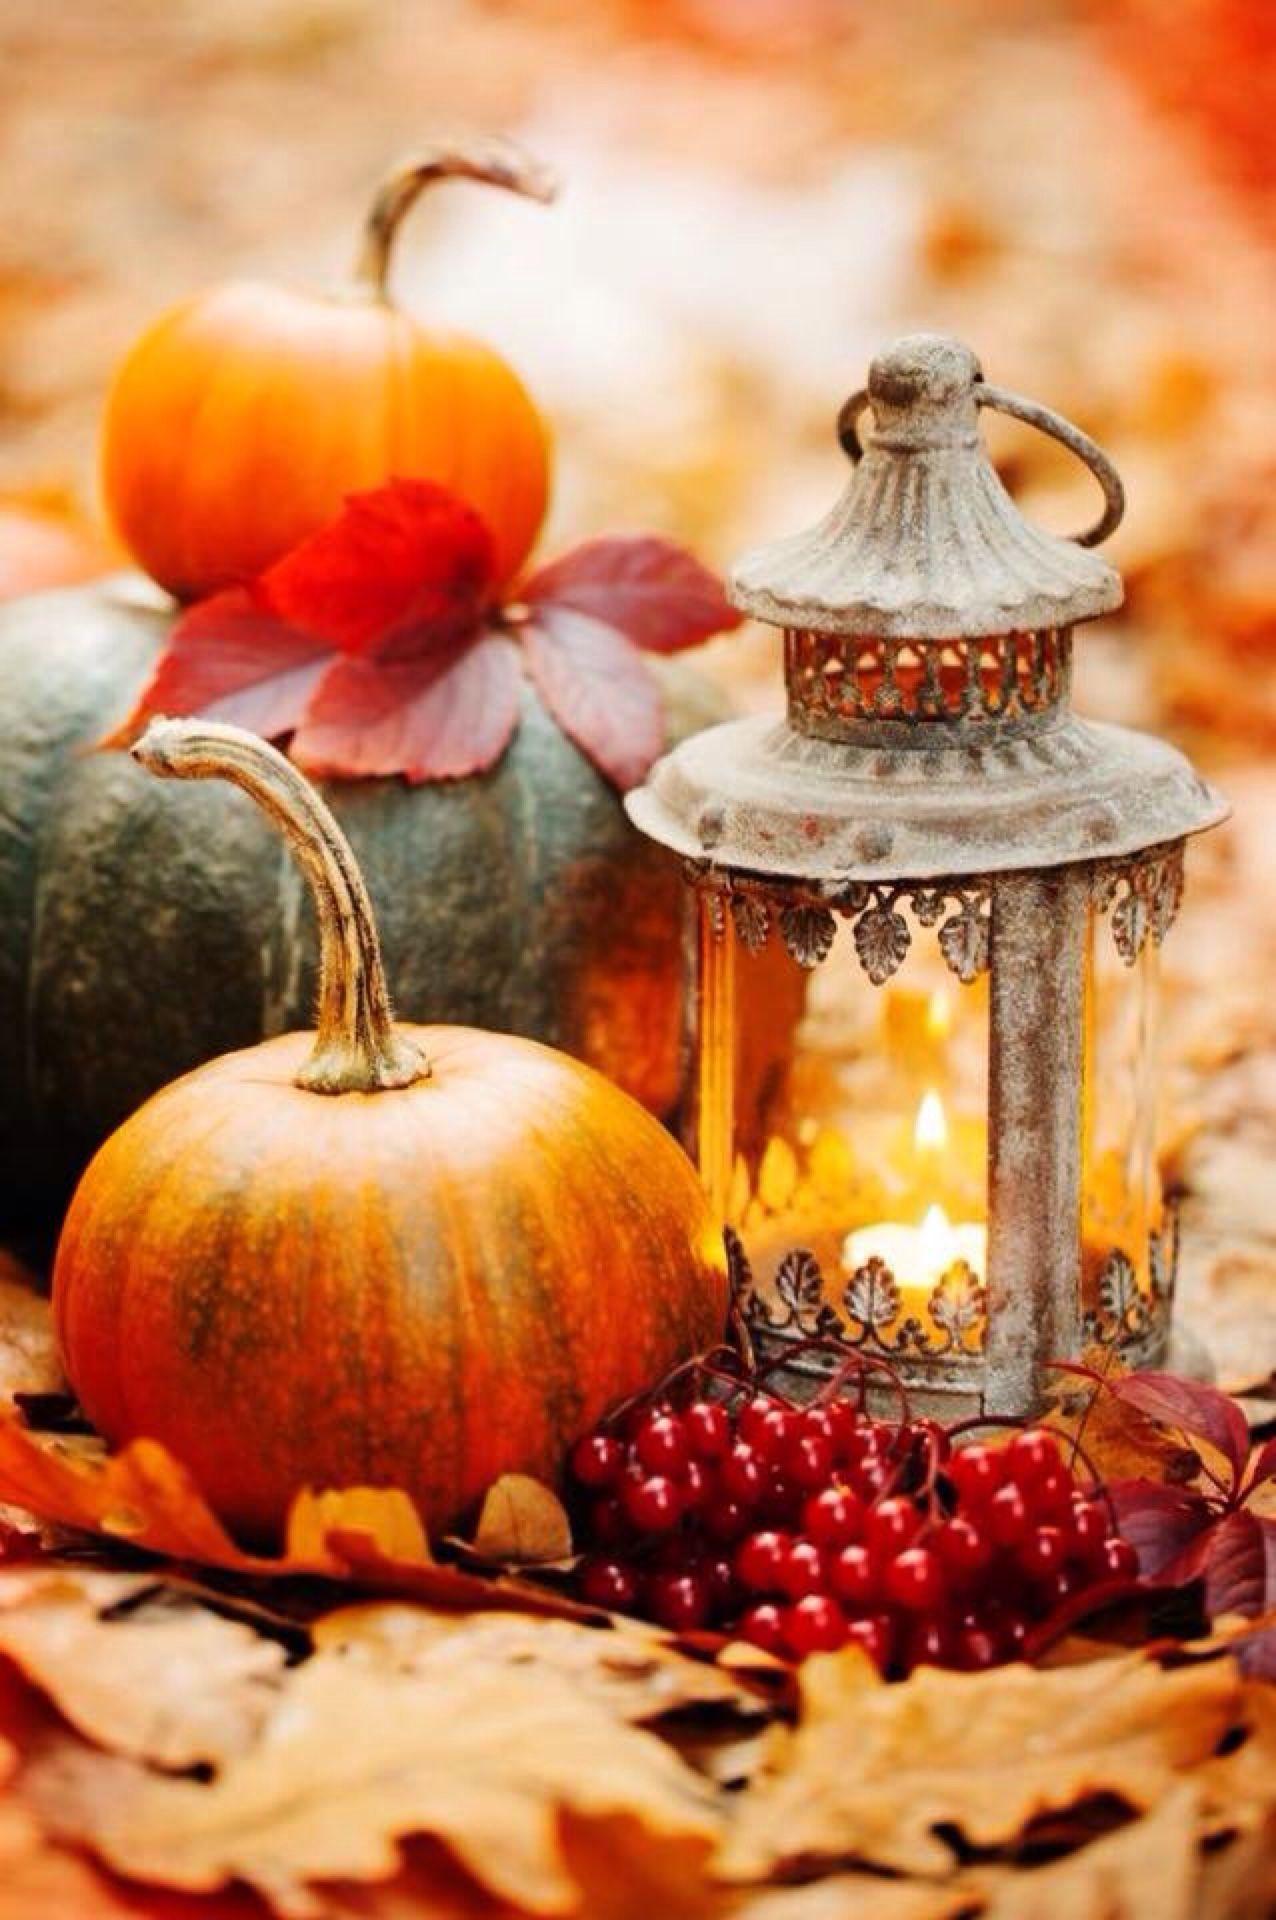 beautiful autumn seasonal fall pinterest herbst herbstdeko und herbst bilder. Black Bedroom Furniture Sets. Home Design Ideas